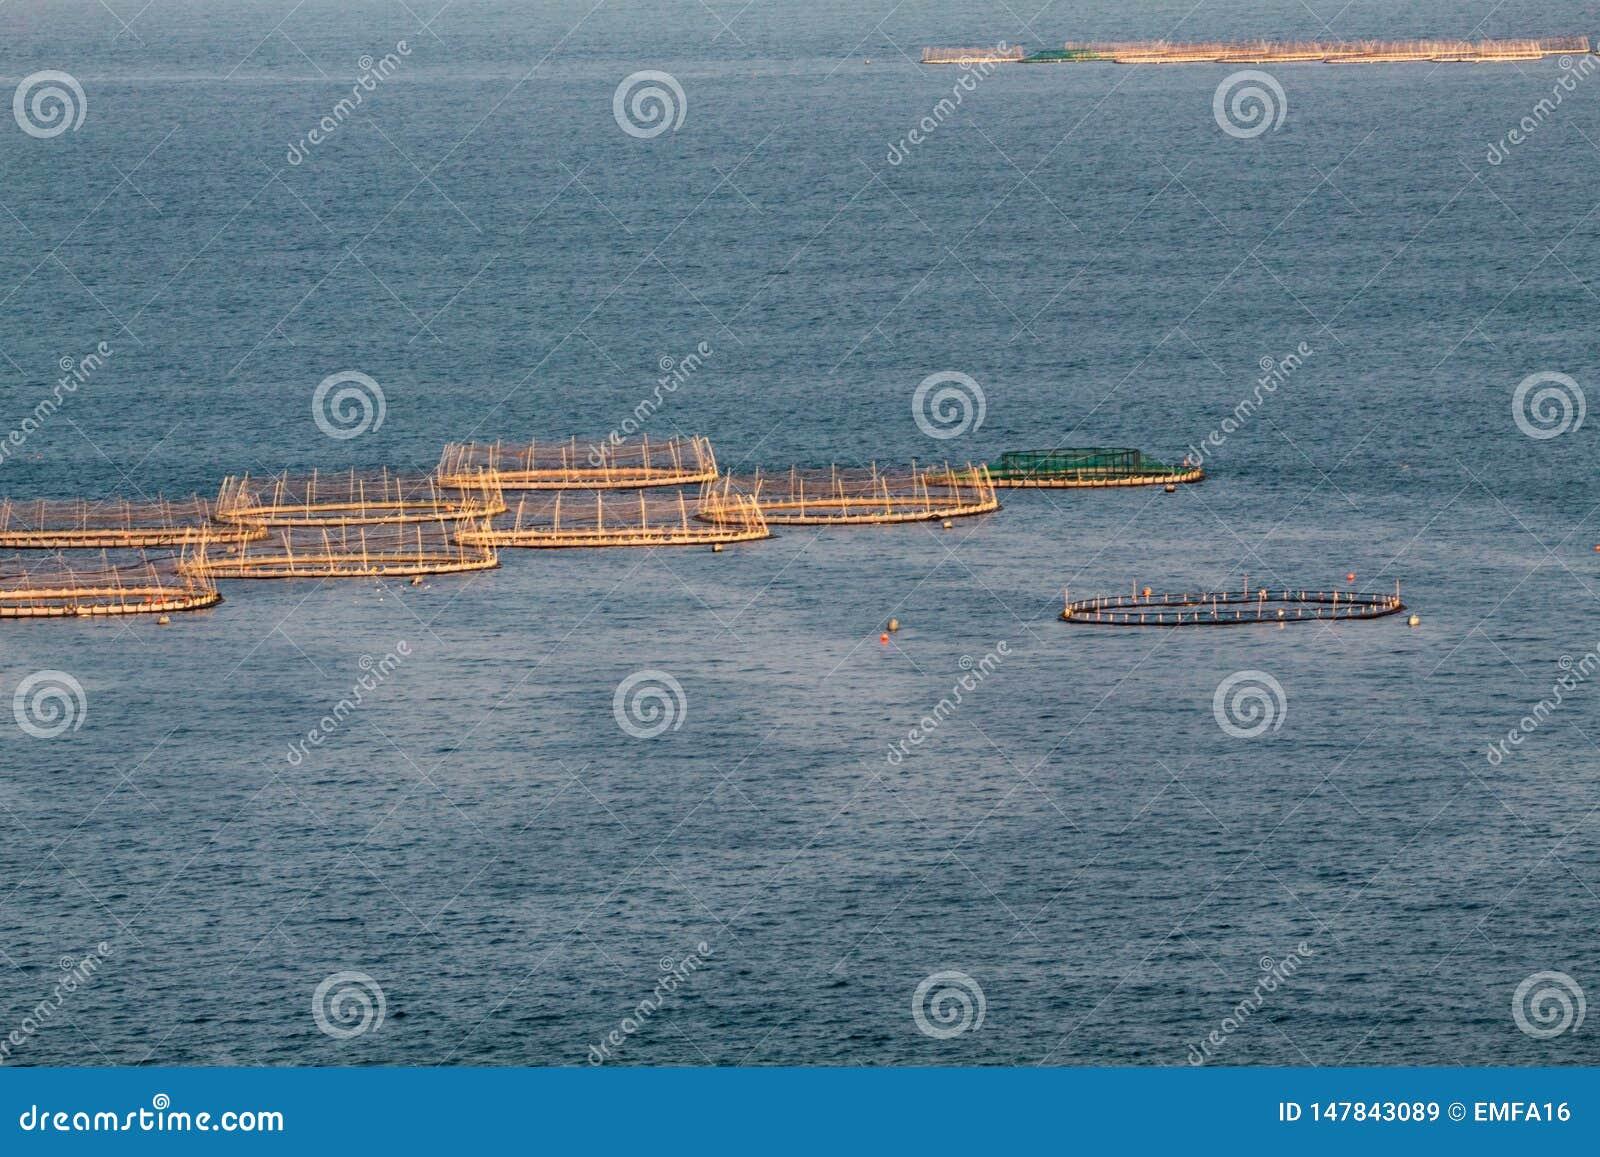 Salmon Farms in het Overzees, Ierland